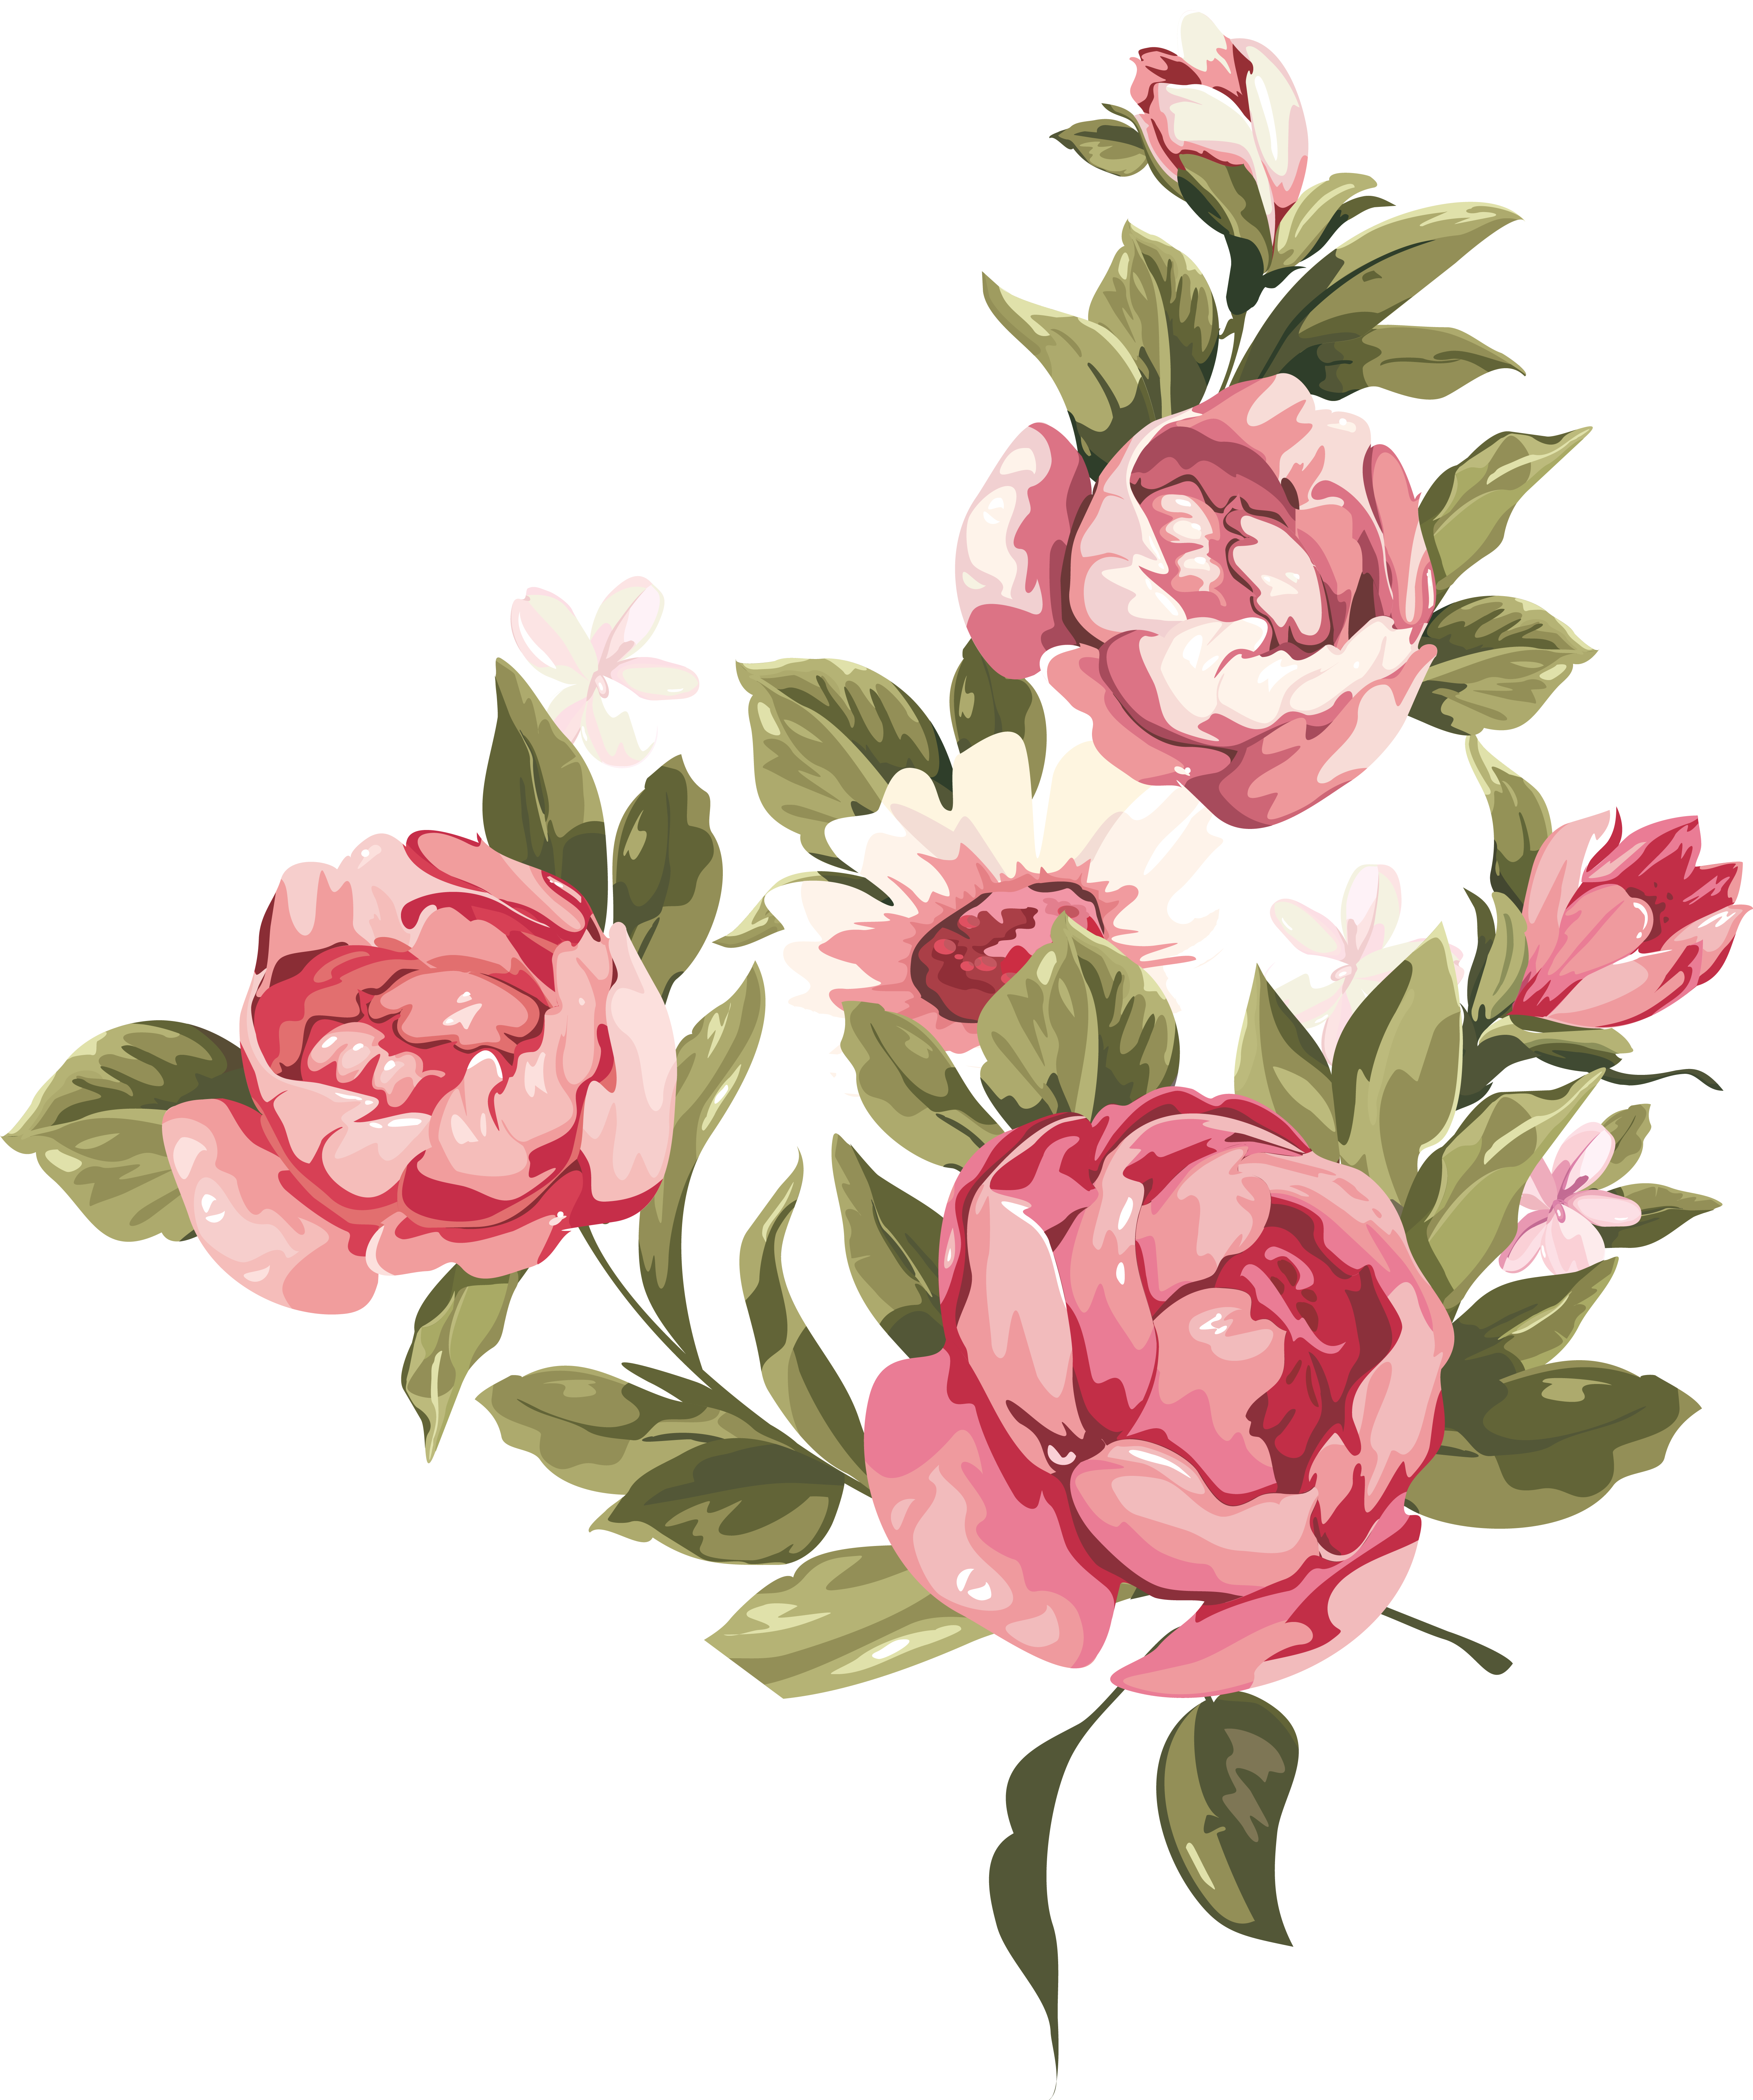 Transparent Old Fashioned Floral Png